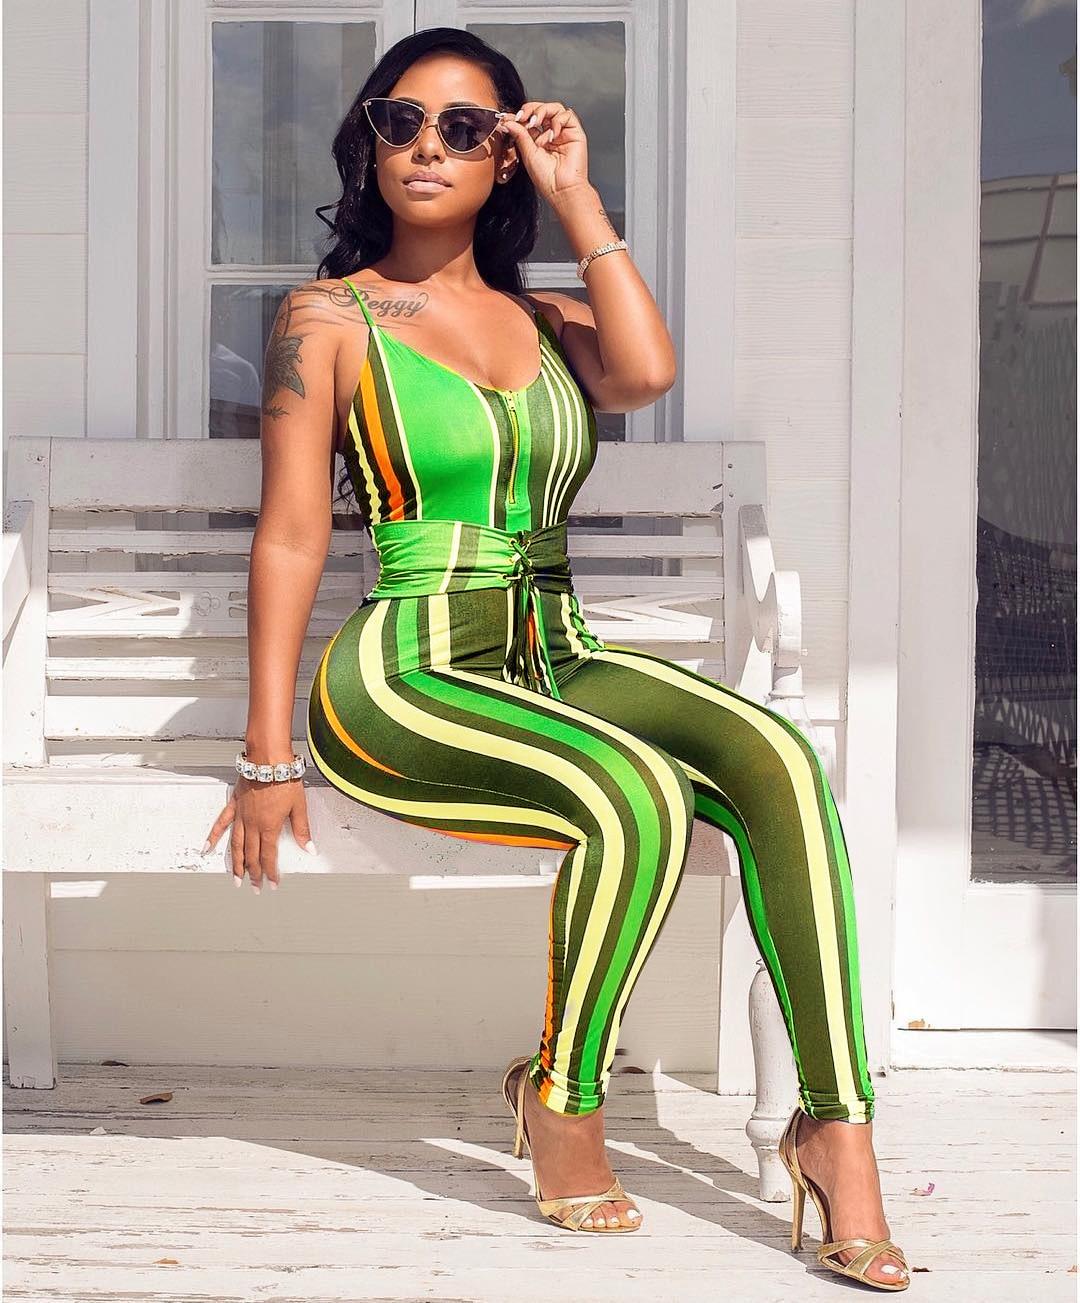 17b57a0b3c08 Q063 Europe and sexy club hot style fashion women's clothing in 2018 amazon  digital printing stripe jumpsuits-in Jumpsuits from Women's Clothing ...